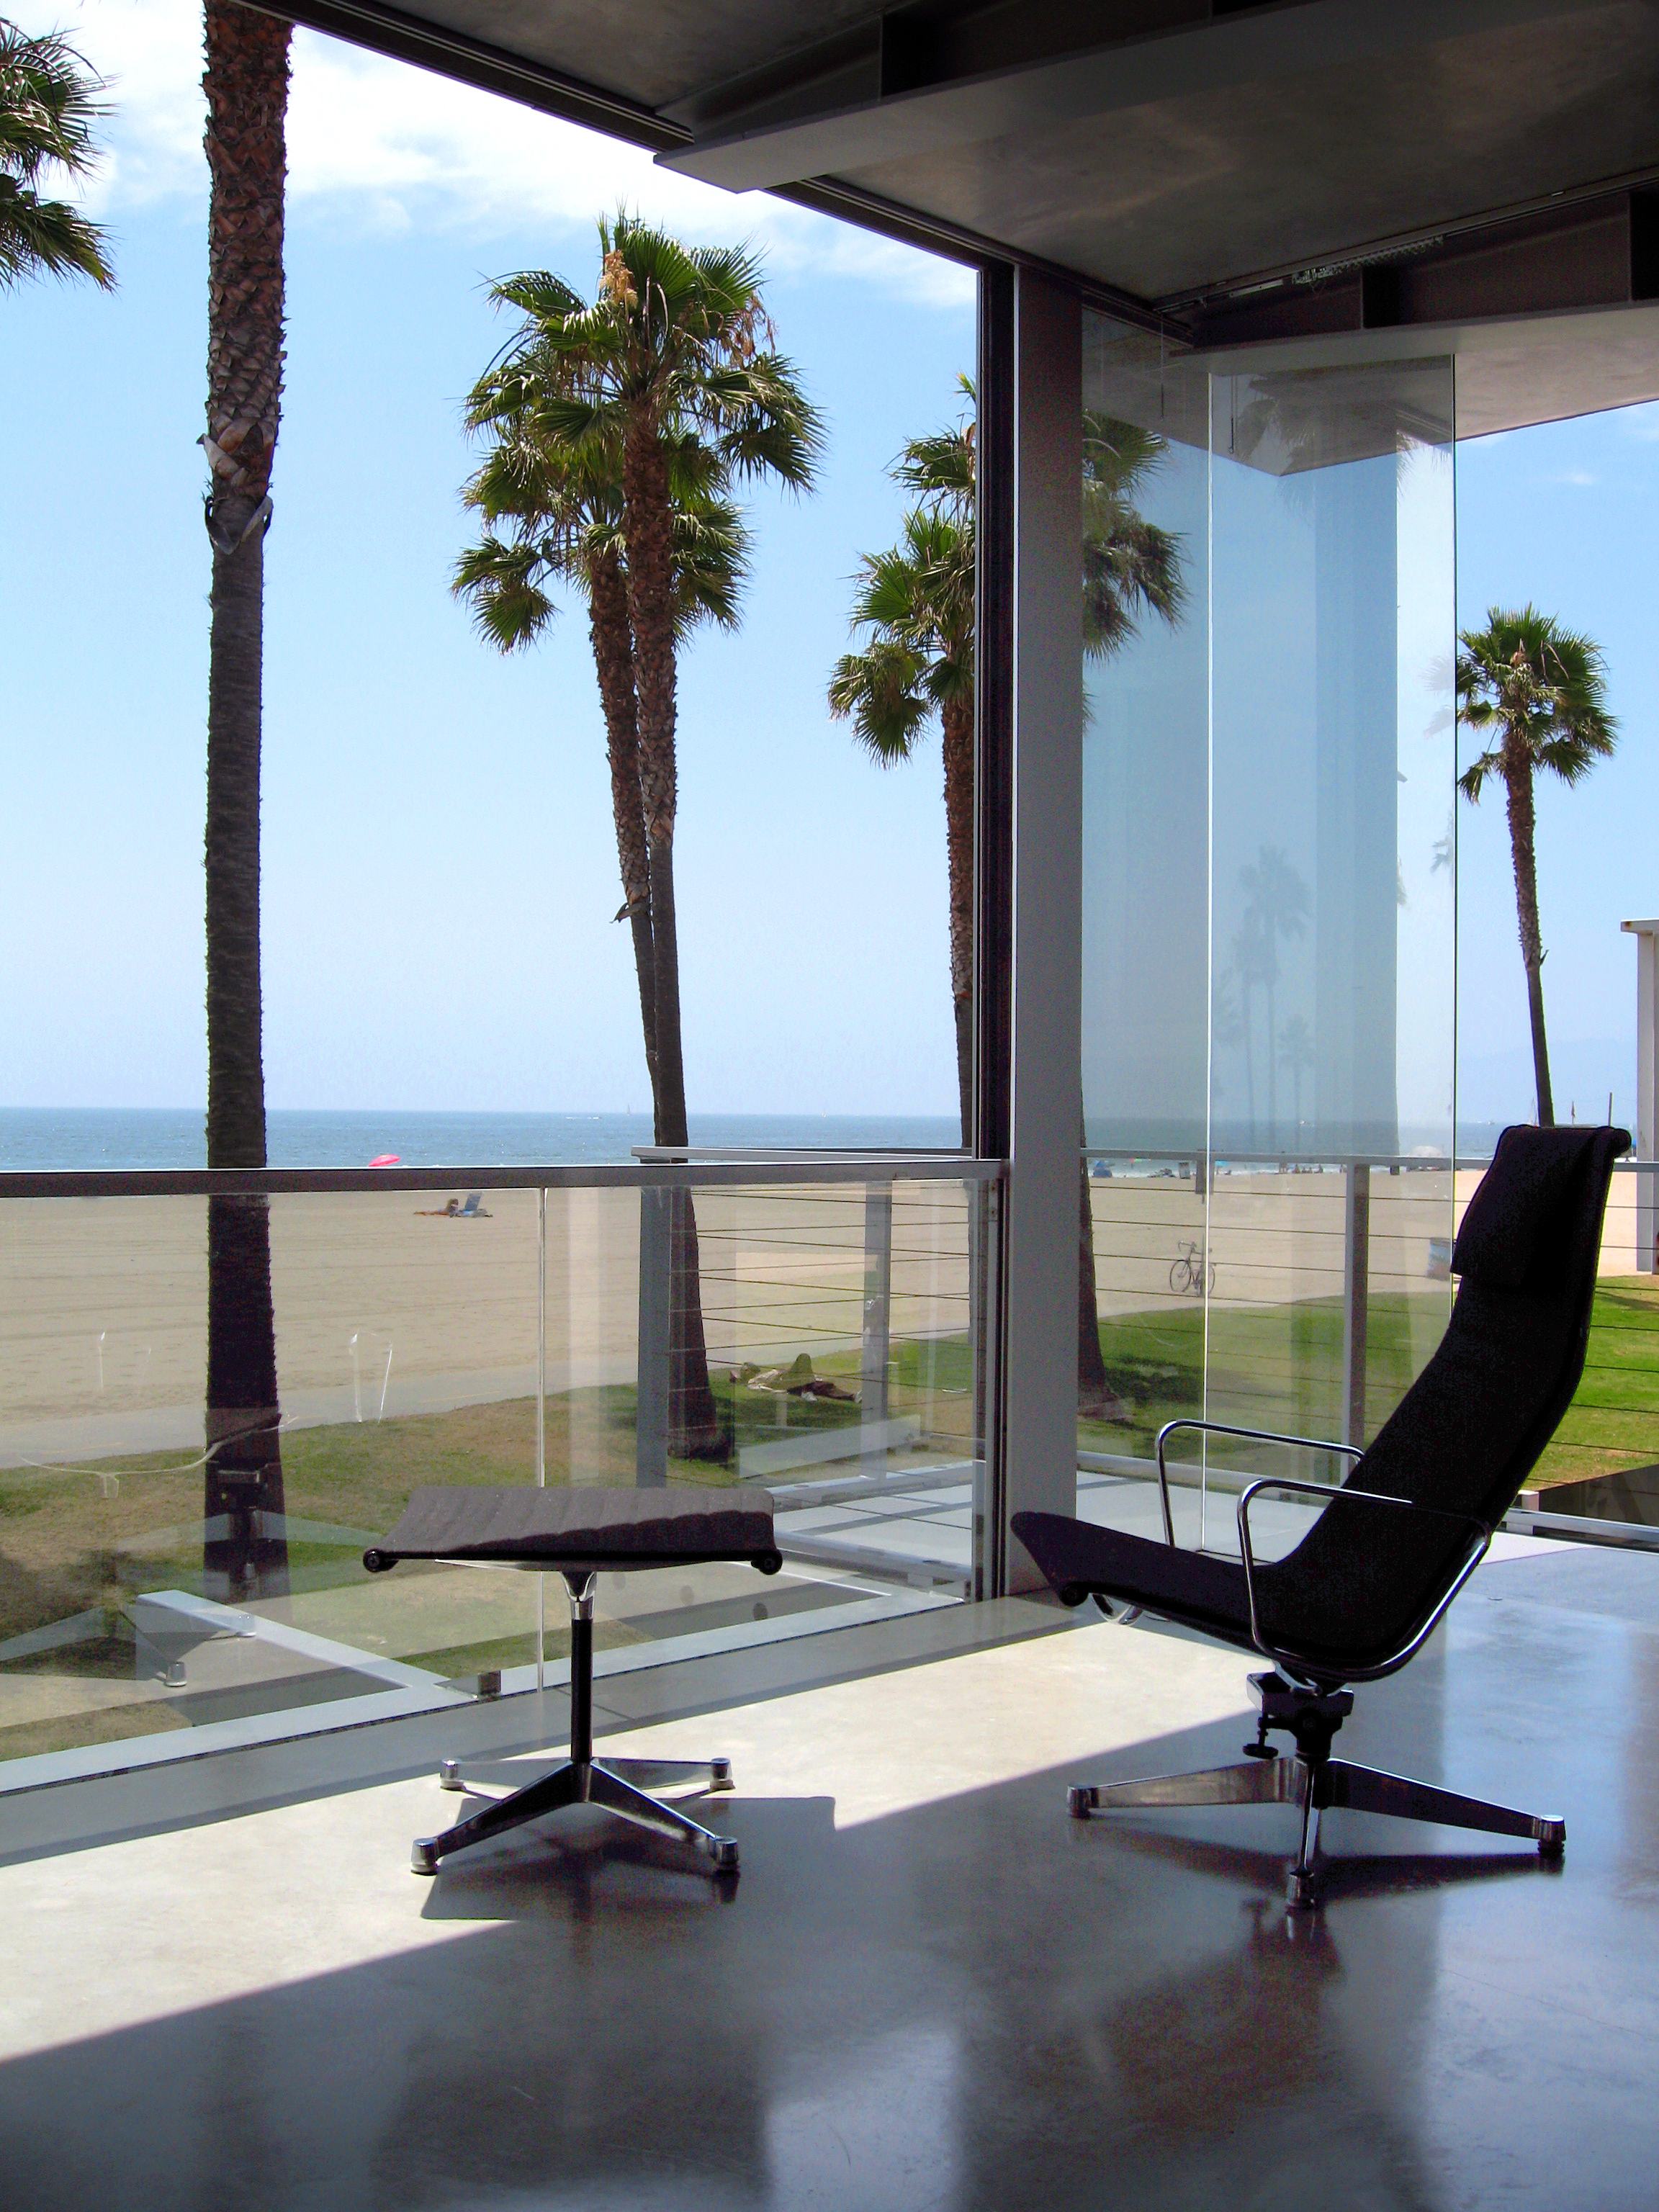 S.E.A.-Studio-Environmental-Architecture-David-Hertz-FAIA-Panel-House-Venice-Beach-California-sustainable-regenerative-restorative-green-design-prefabricated-aluminum-refrigeration-open-concept-ocean-view-residential-glass-steel-sunset-interior-11.jpg